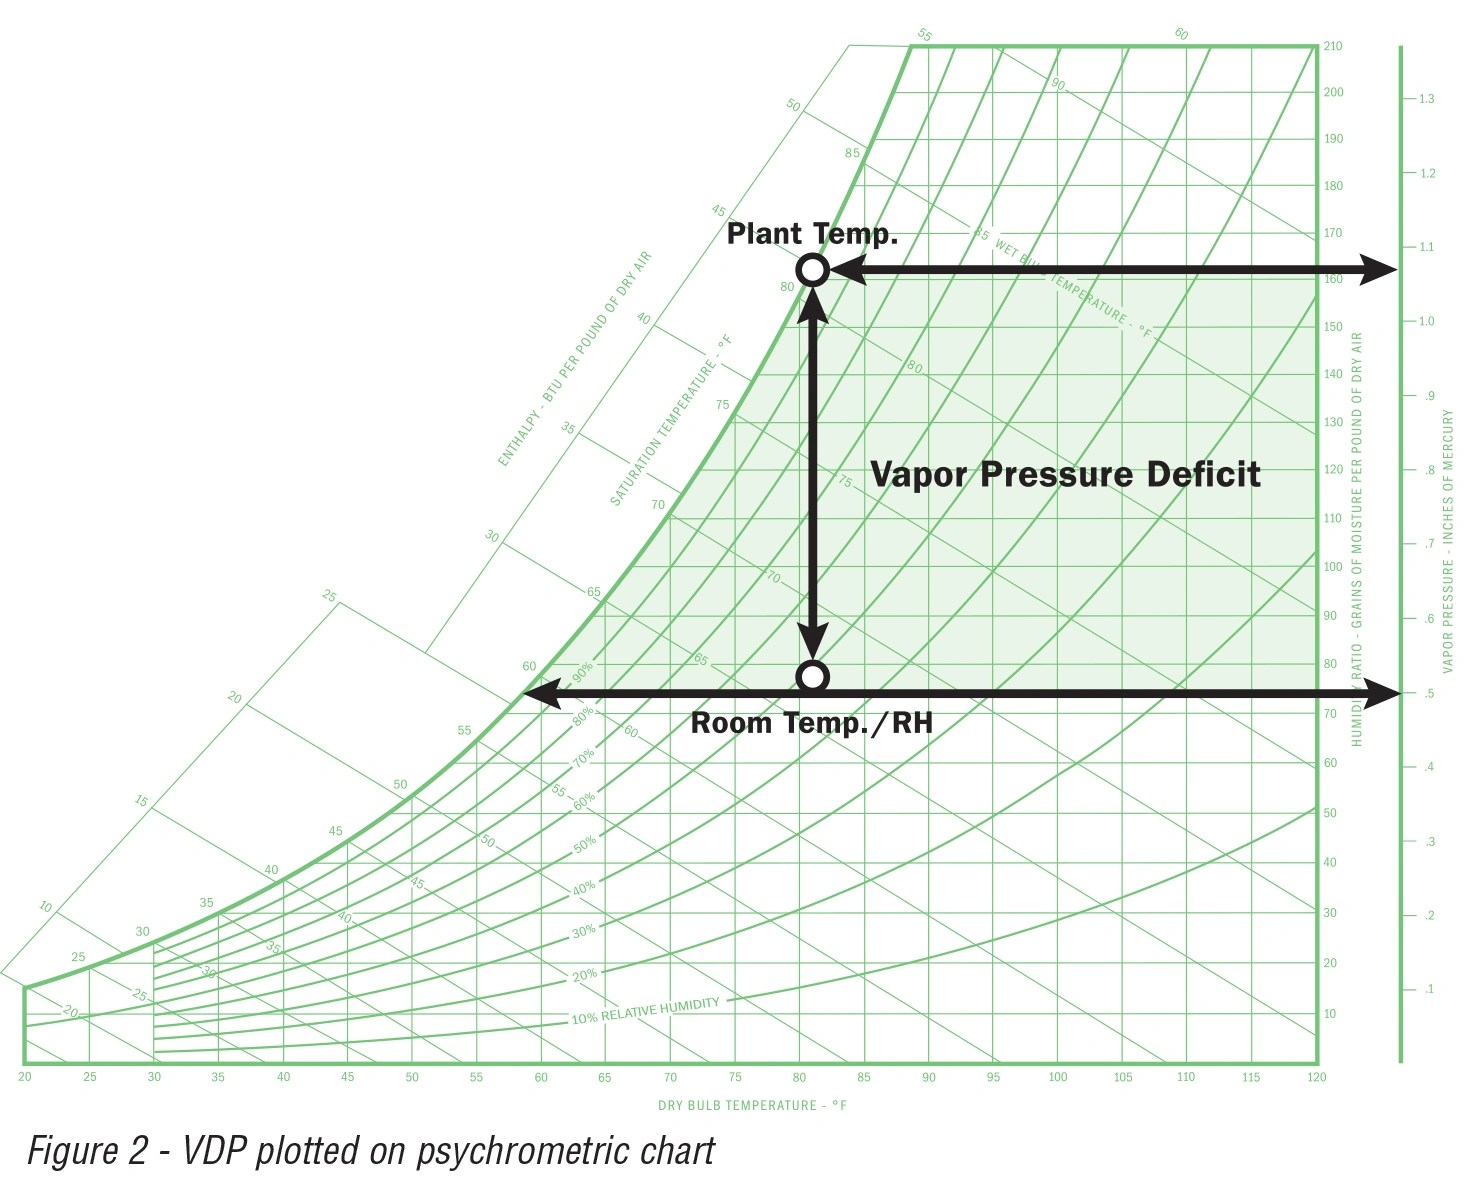 Application Note 28 Vapor Pressure Defecif Amp Hvac System